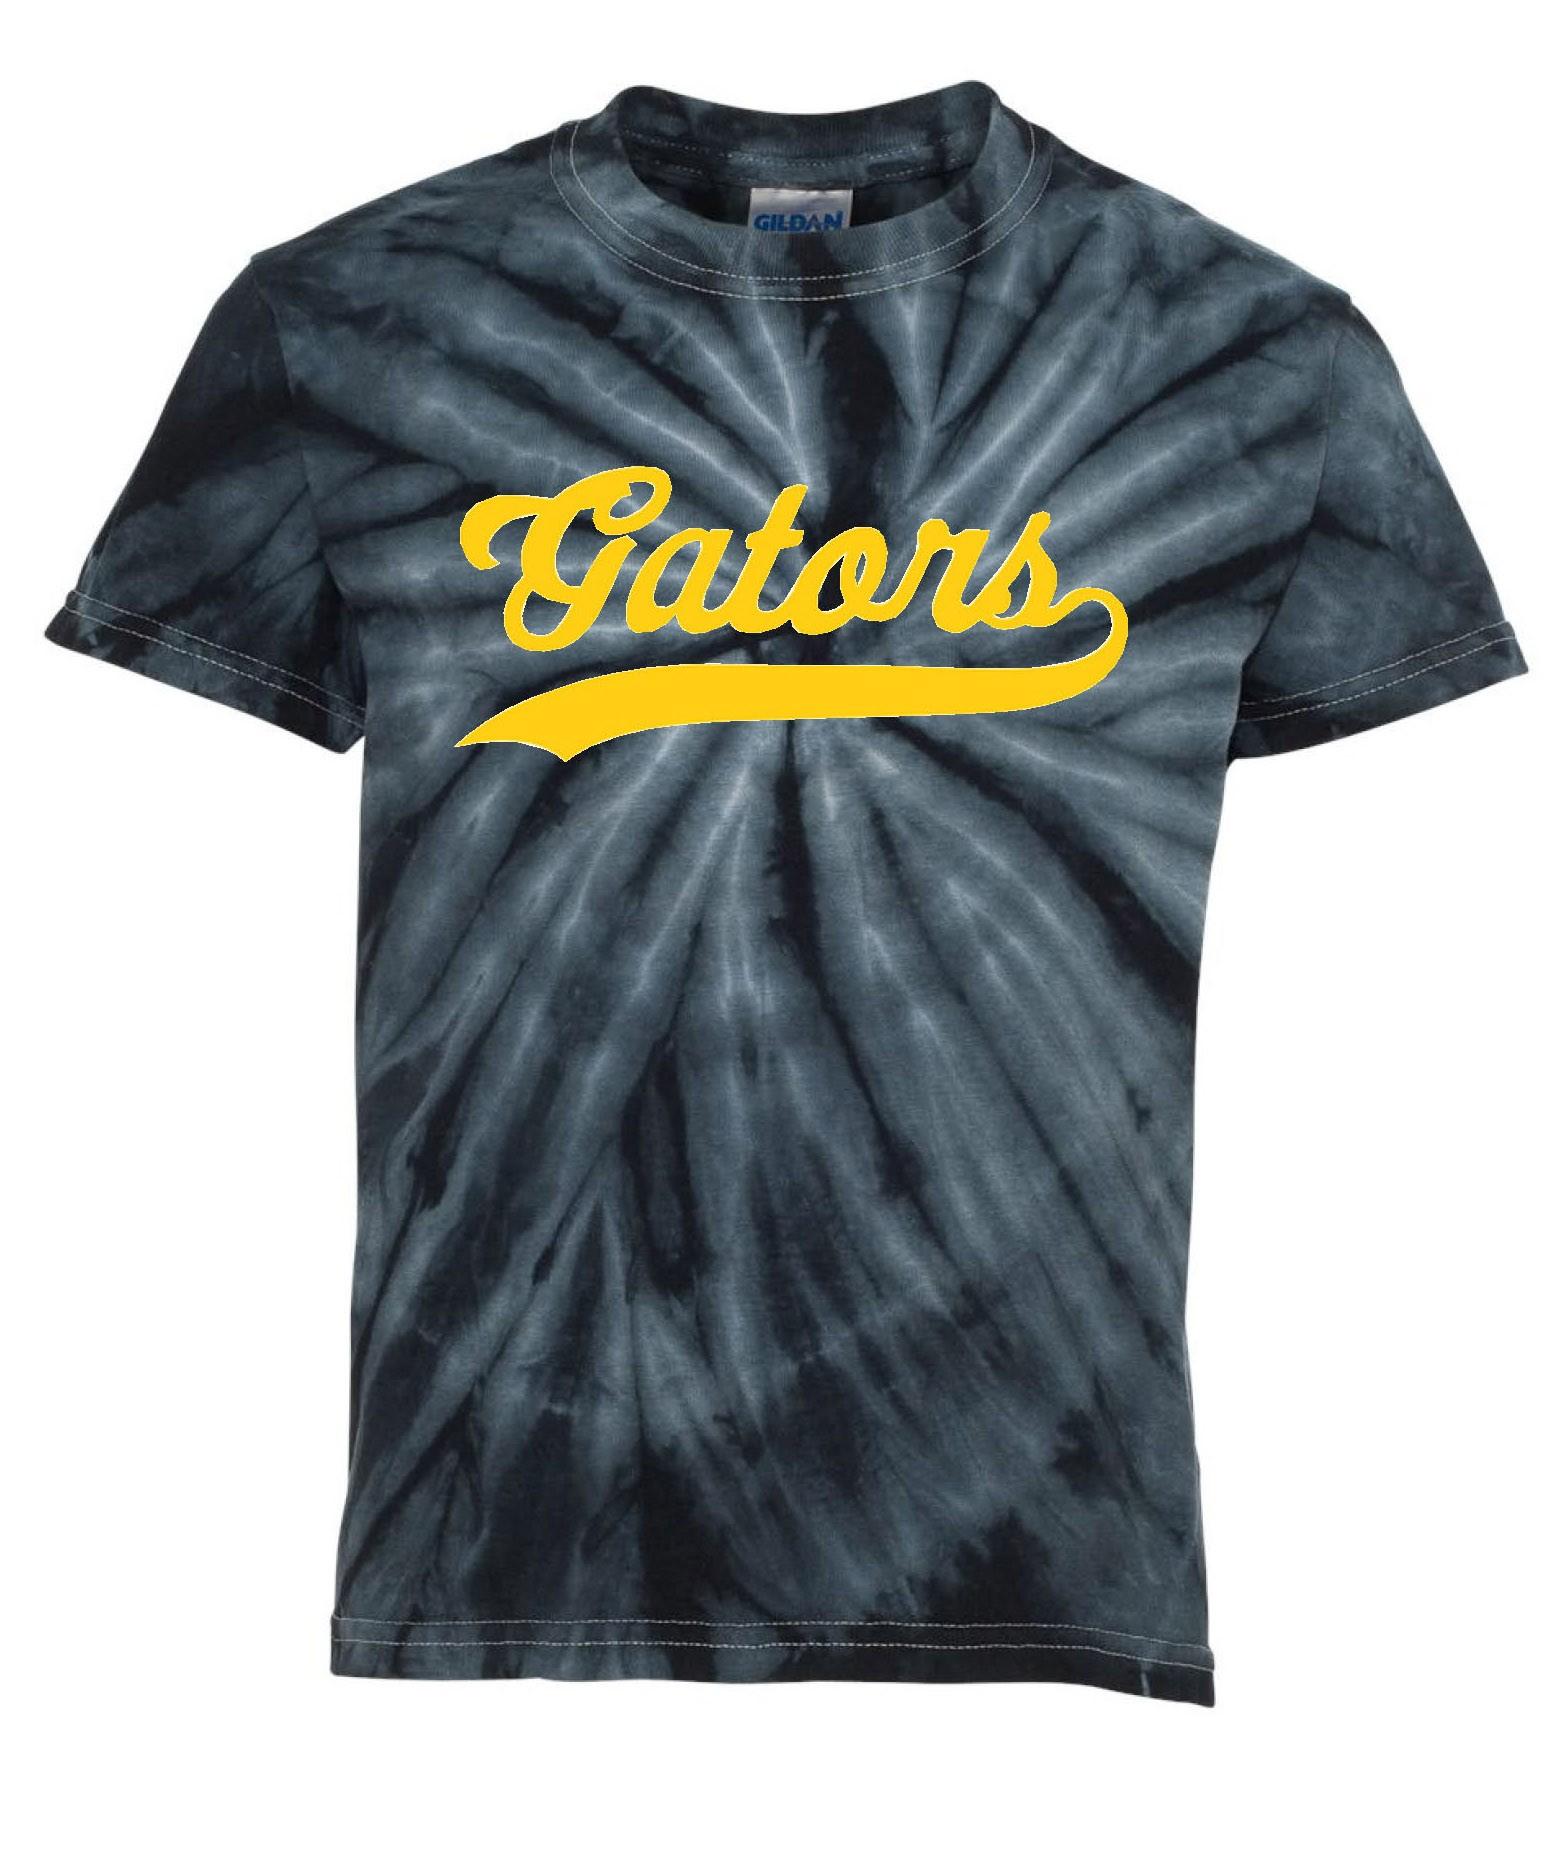 Albany Gators Tye Dye T-Shirts